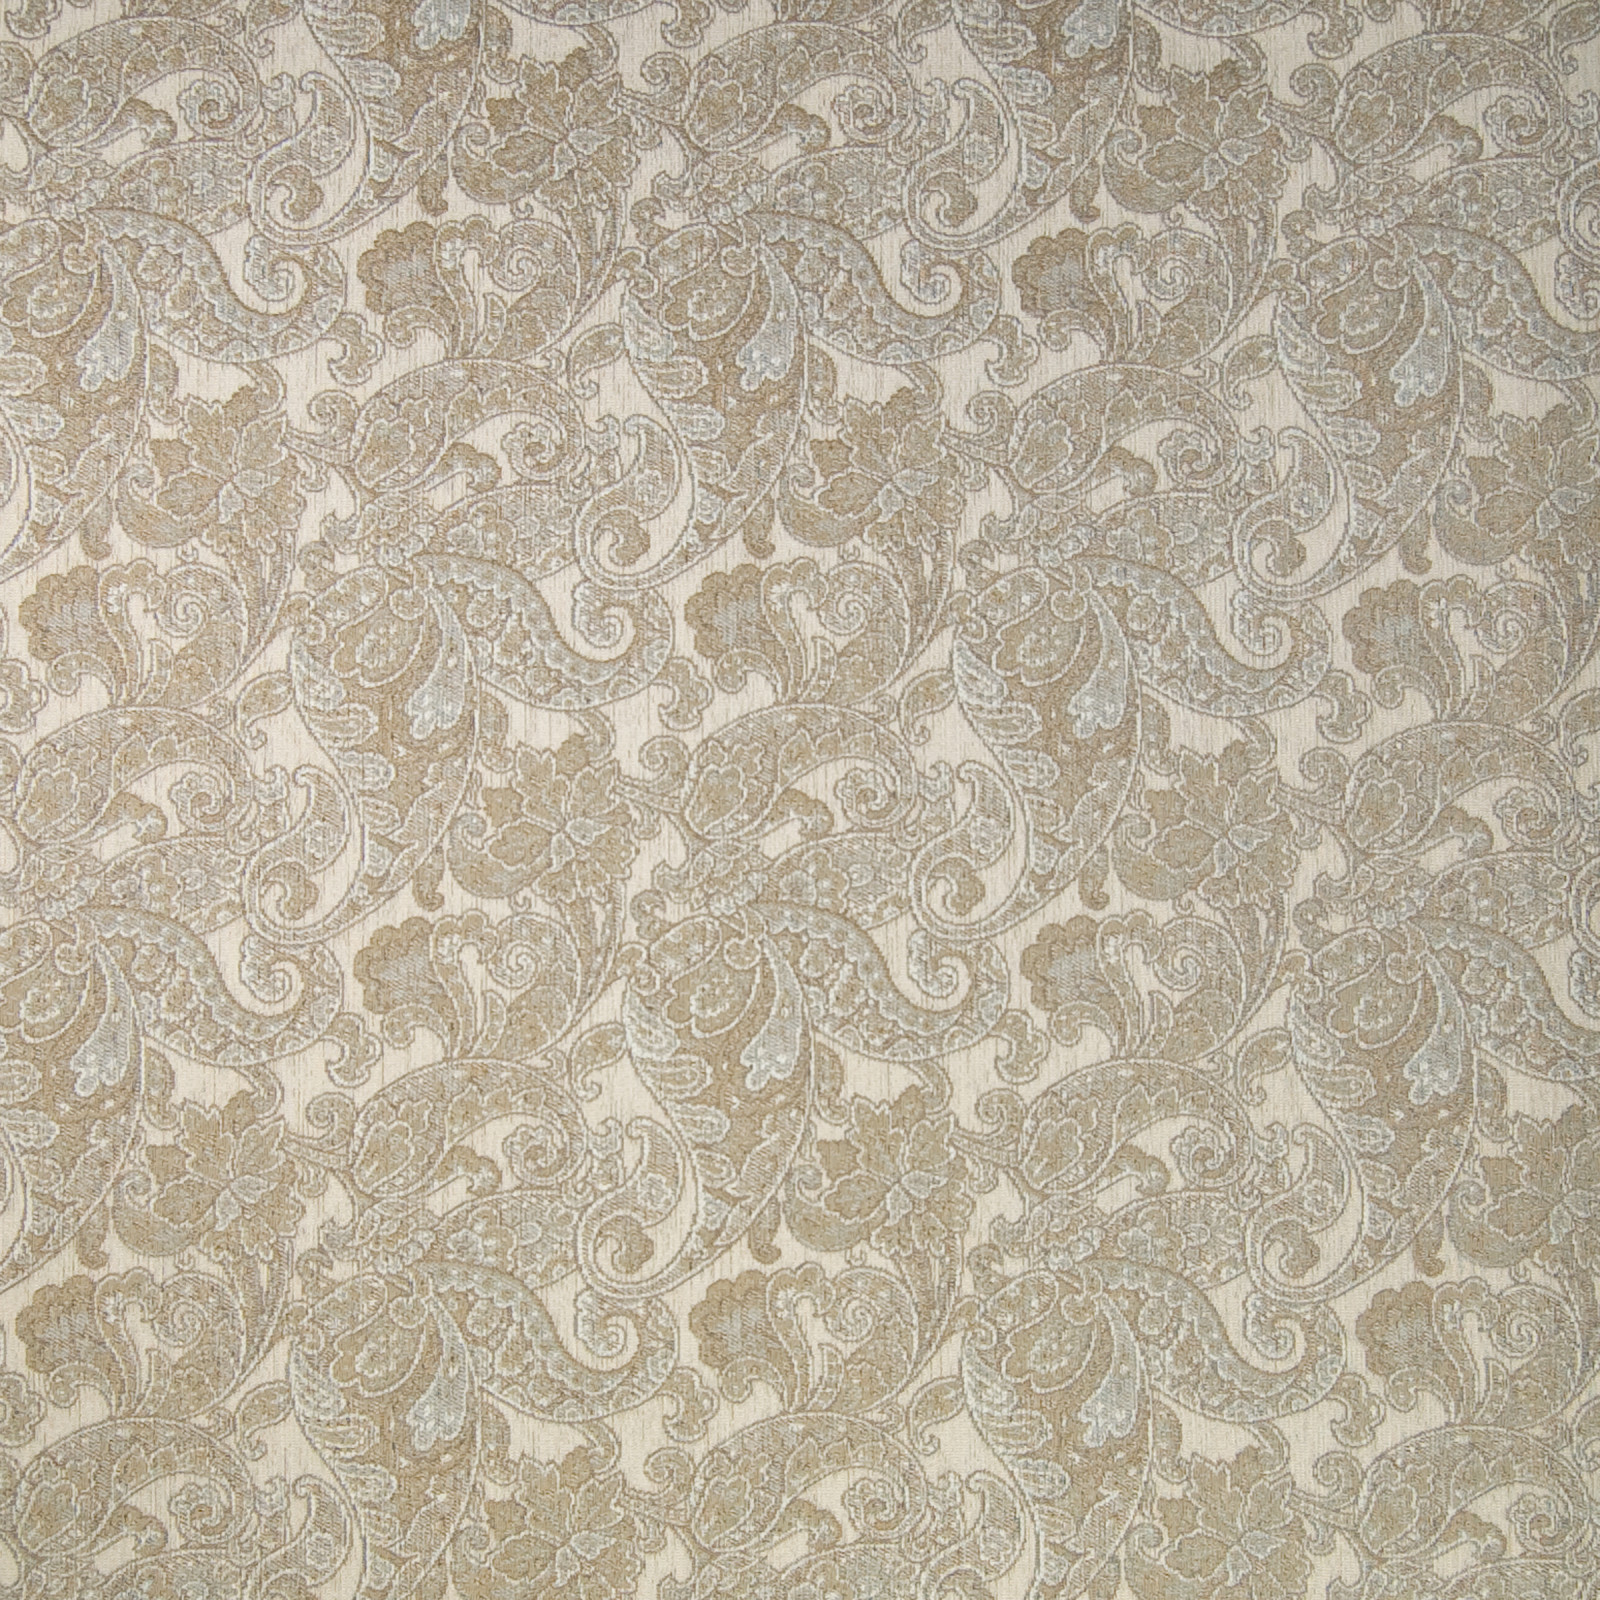 houndstooth sofa fabric bed studio flat b2022 cream   greenhouse fabrics